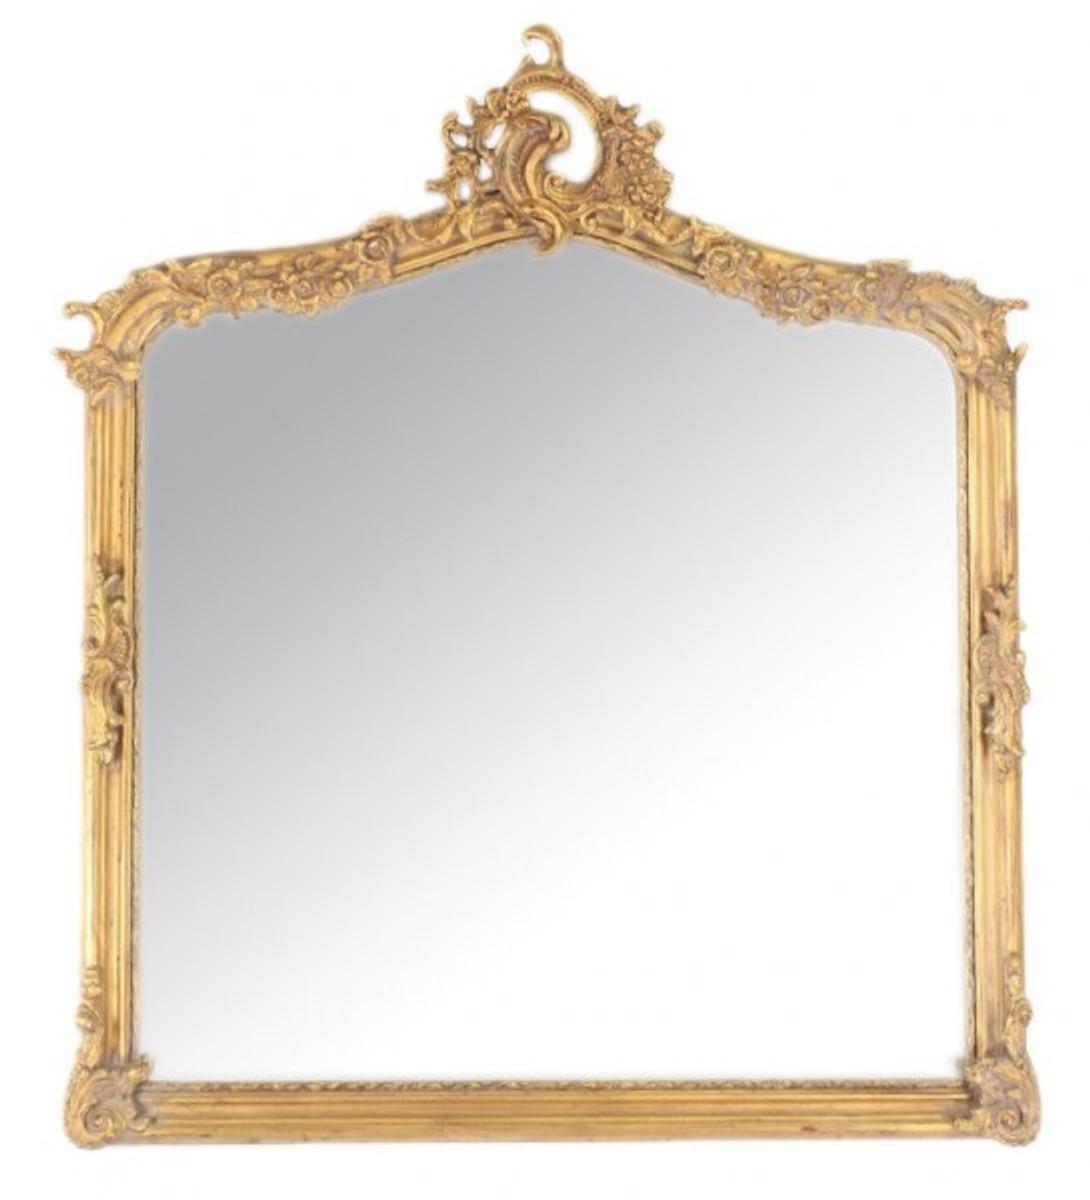 casa padrino barock wandspiegel antik gold italienischer antik stil 115 x 100 cm edel. Black Bedroom Furniture Sets. Home Design Ideas